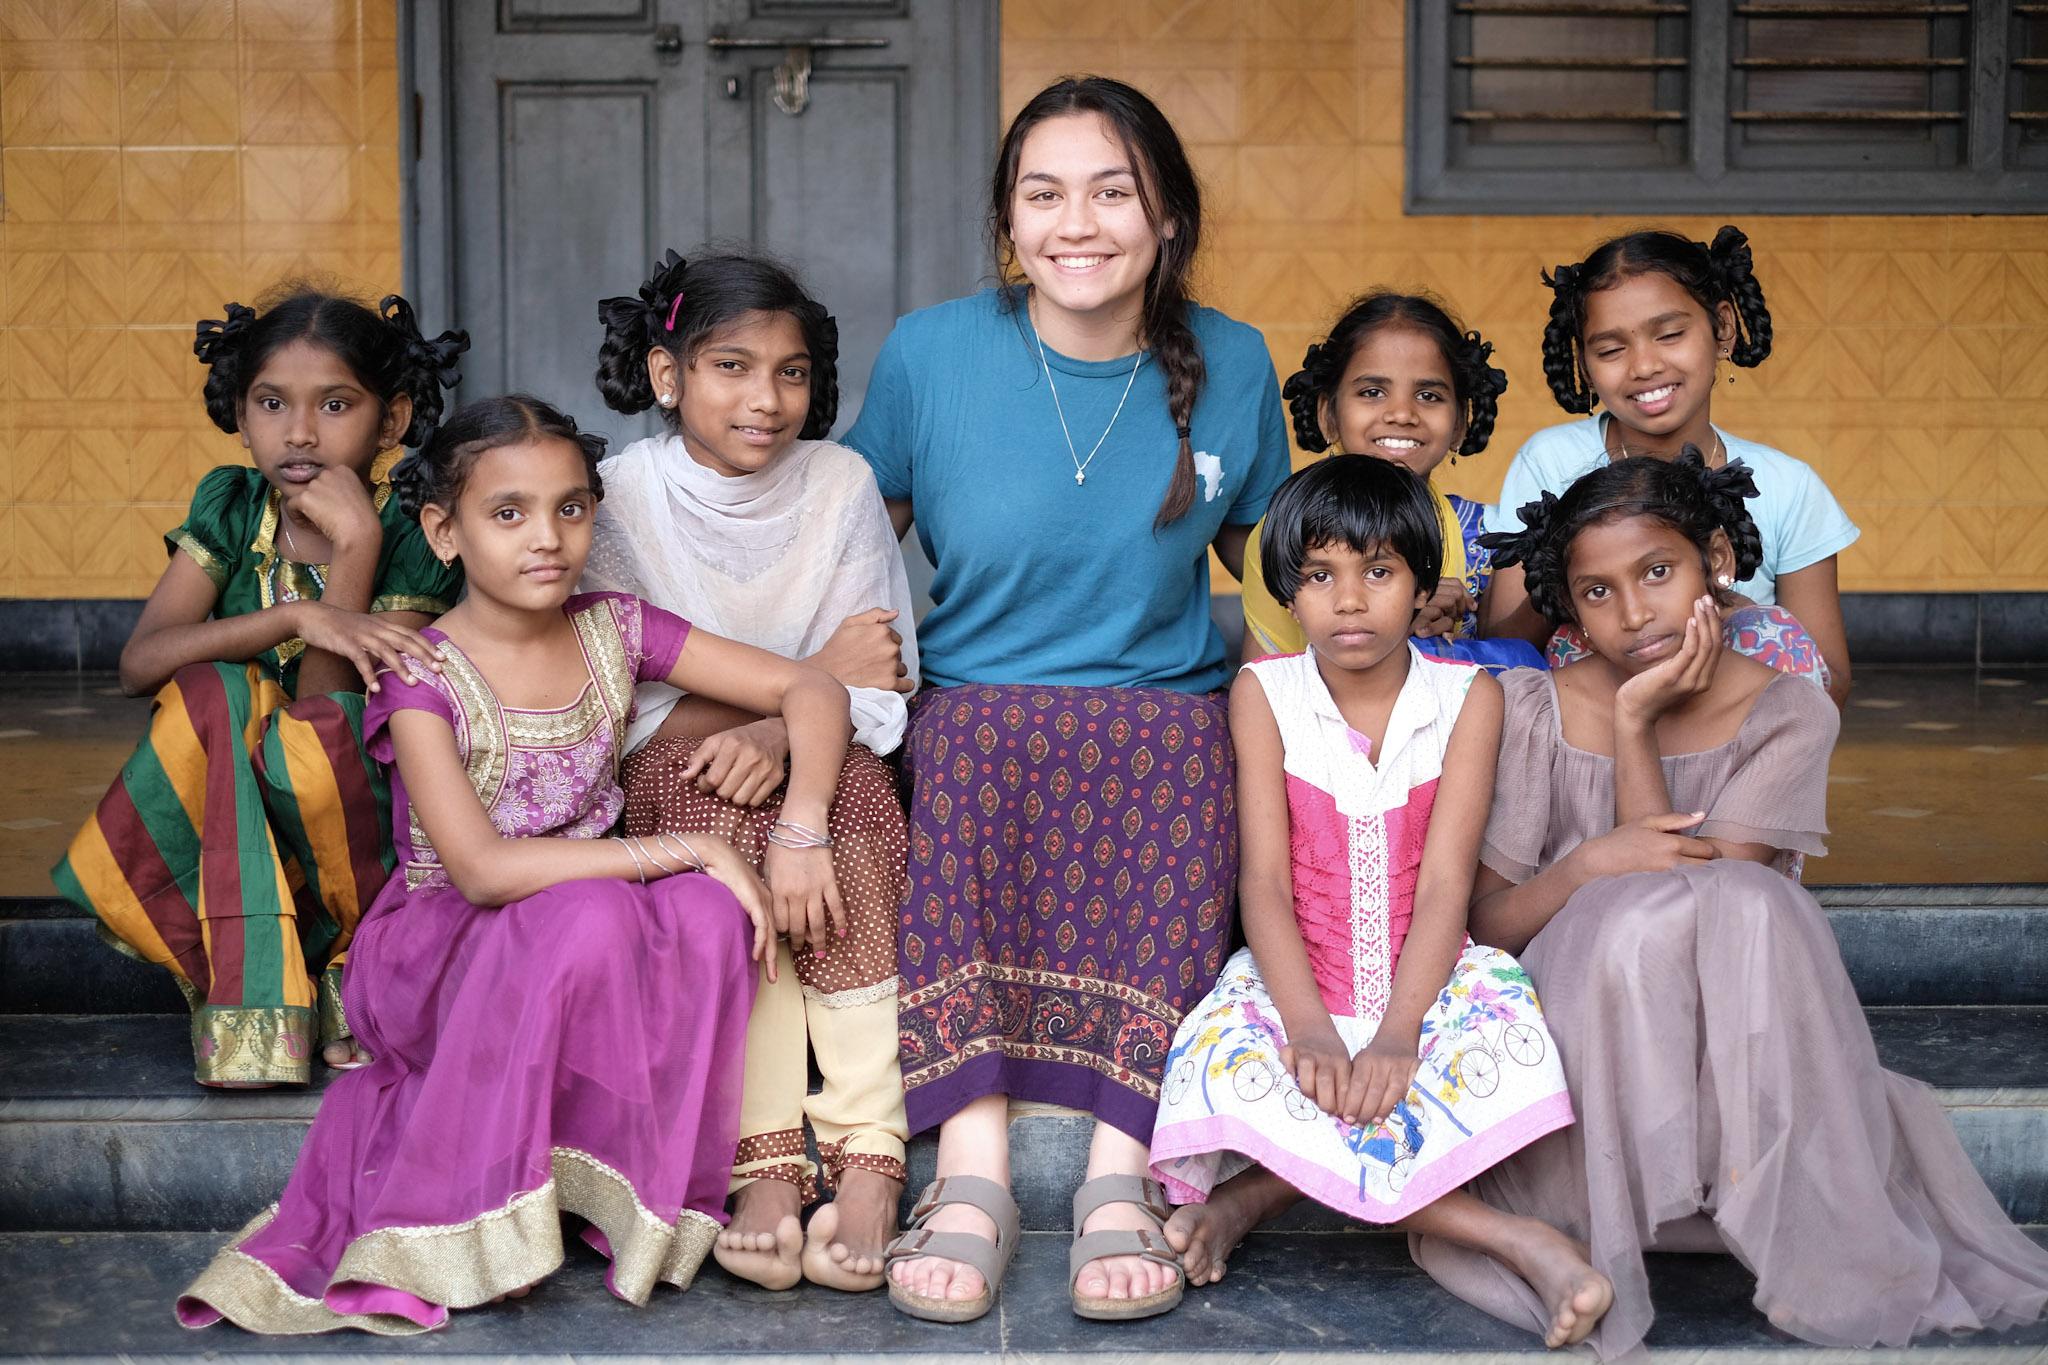 472-KateWurmIndia-180217-6557-1282.jpg